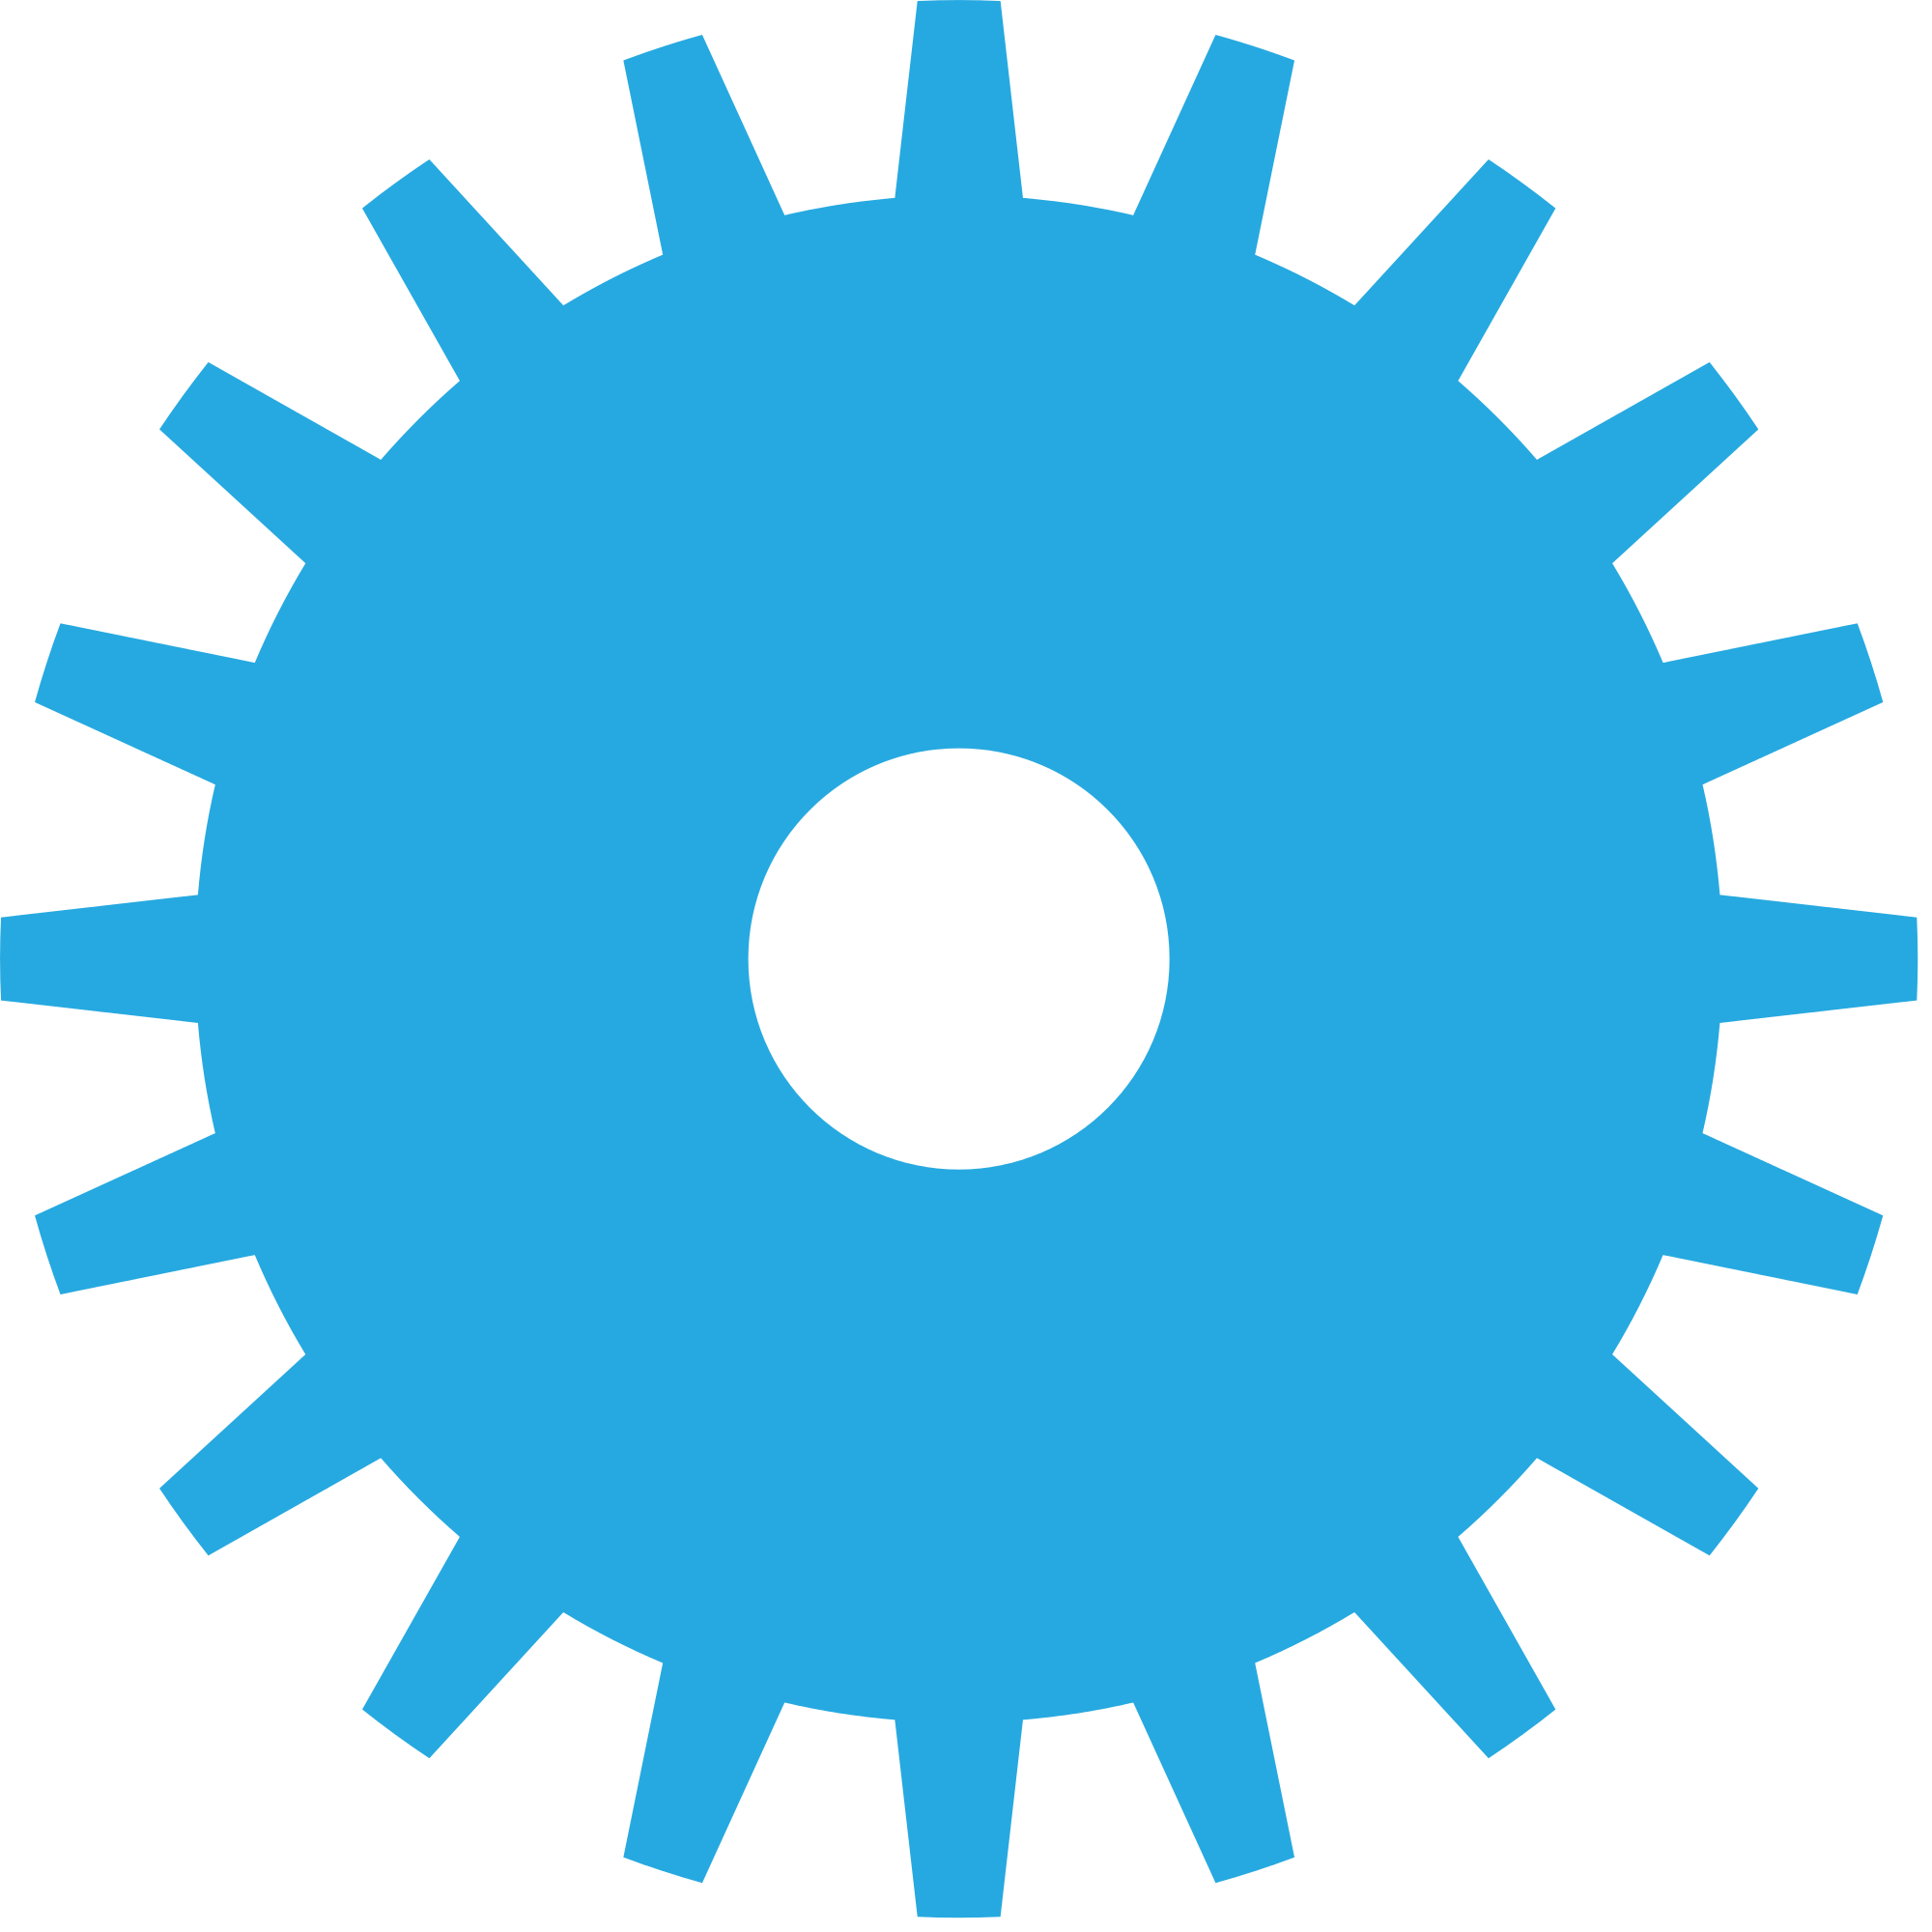 Gear clipart colorful gear. File shape blue svg